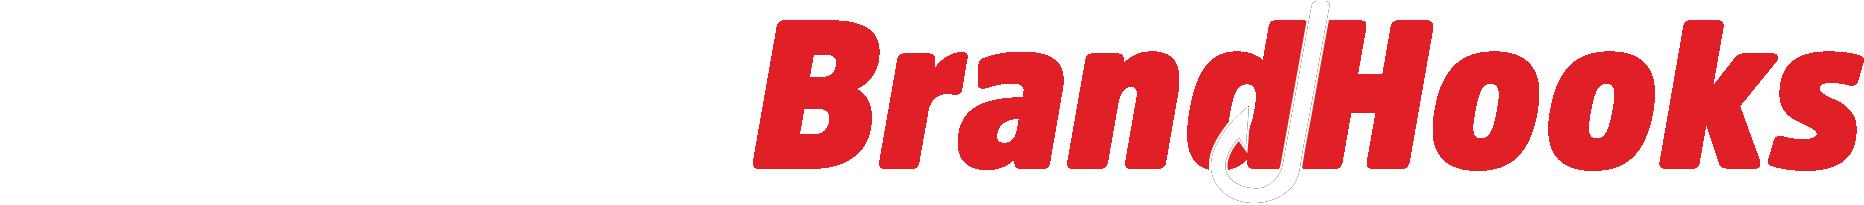 logo_new1 (3)